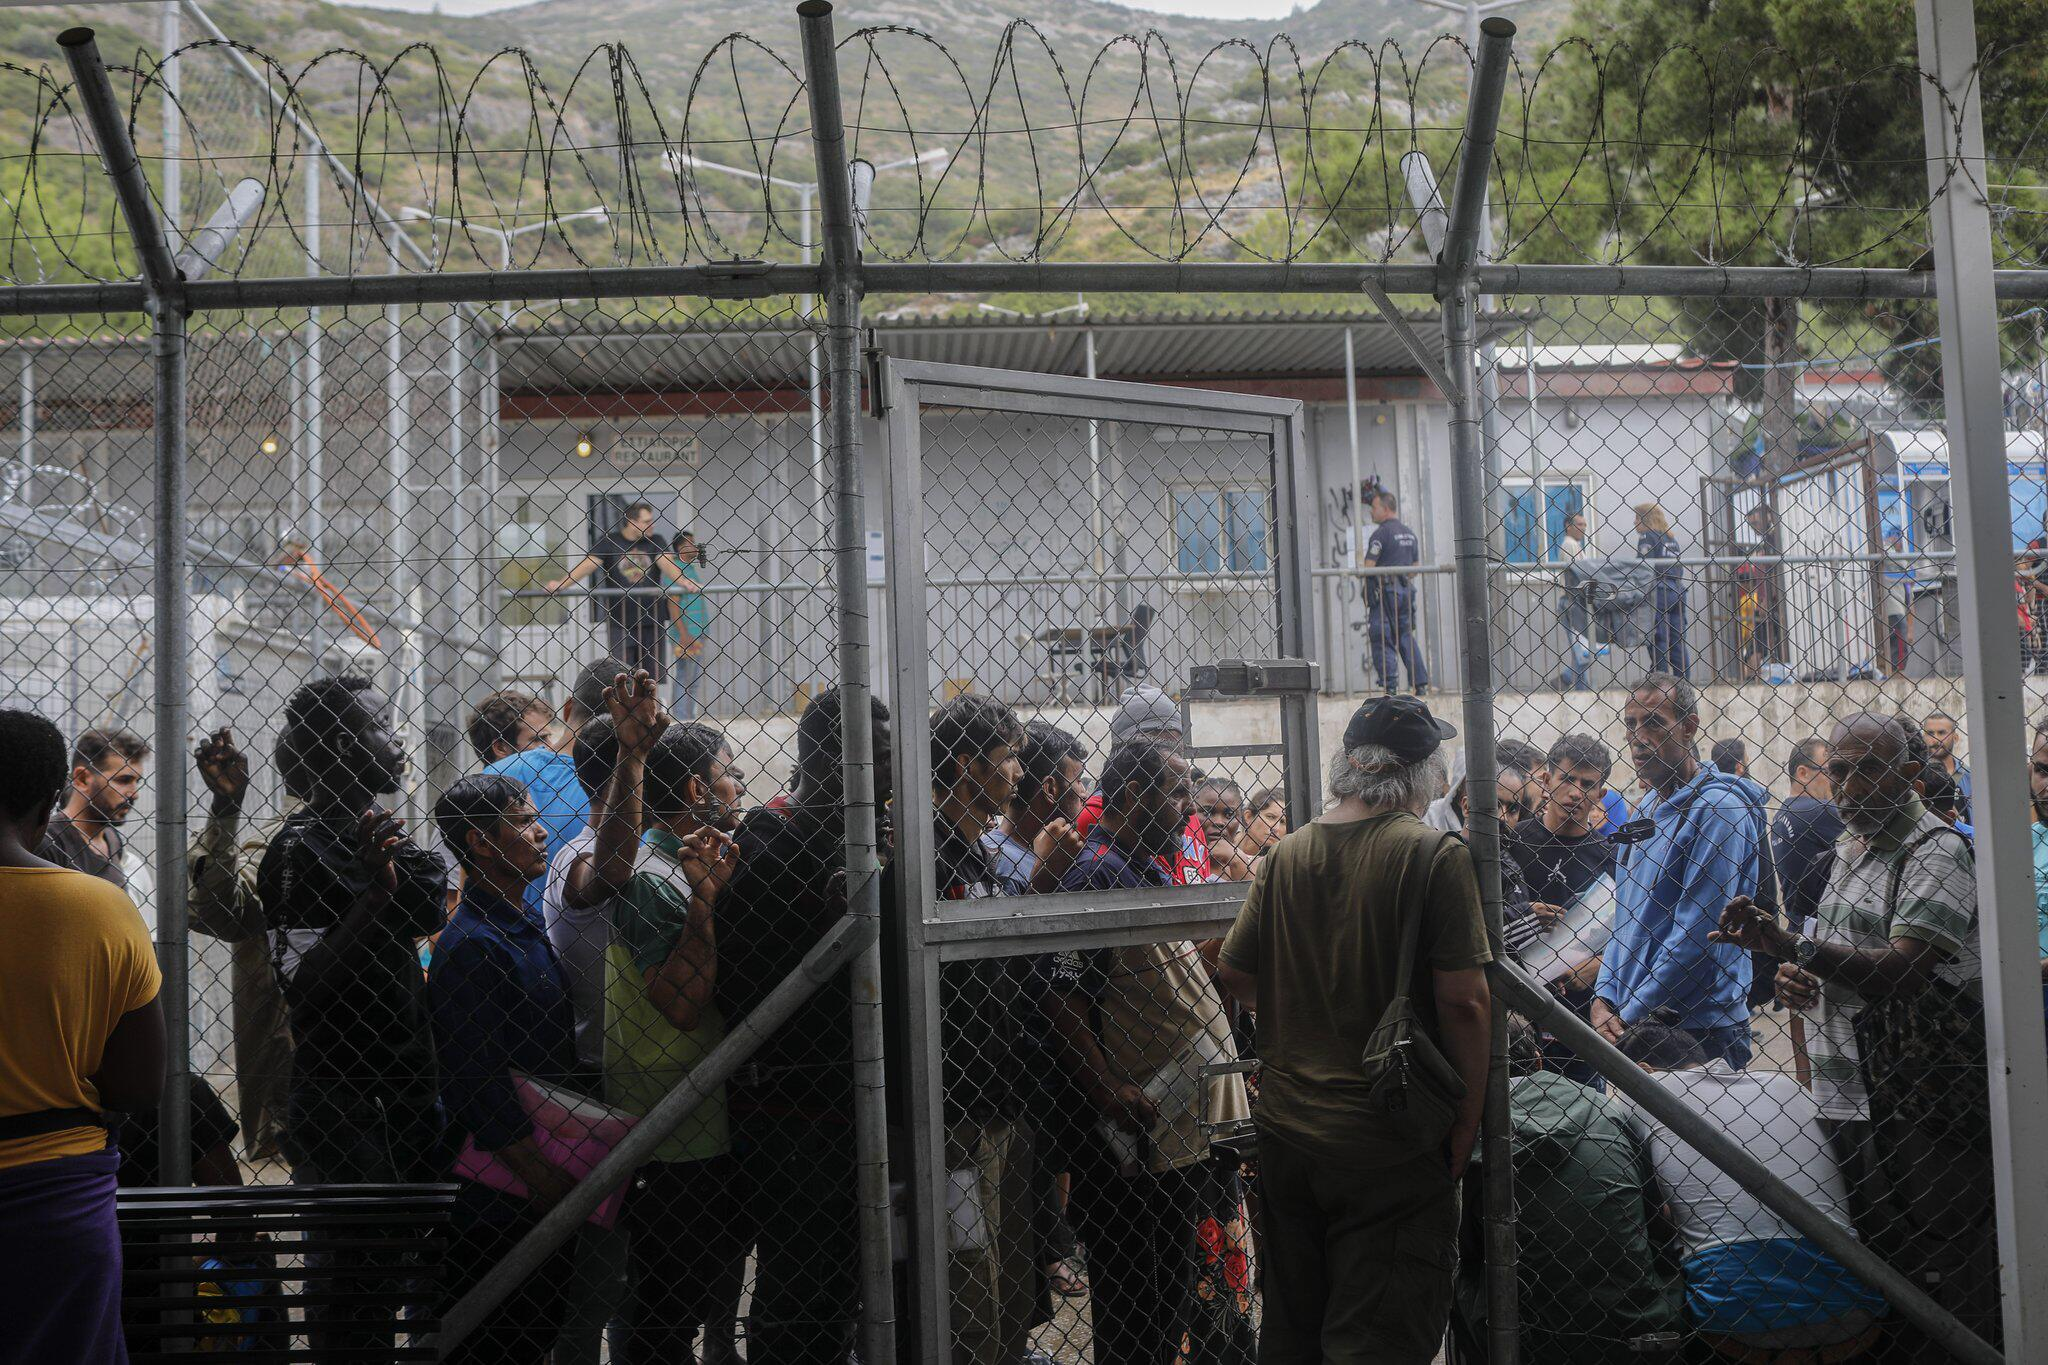 Bild zu Griechische Regierung will drei Flüchtlingslager schließen